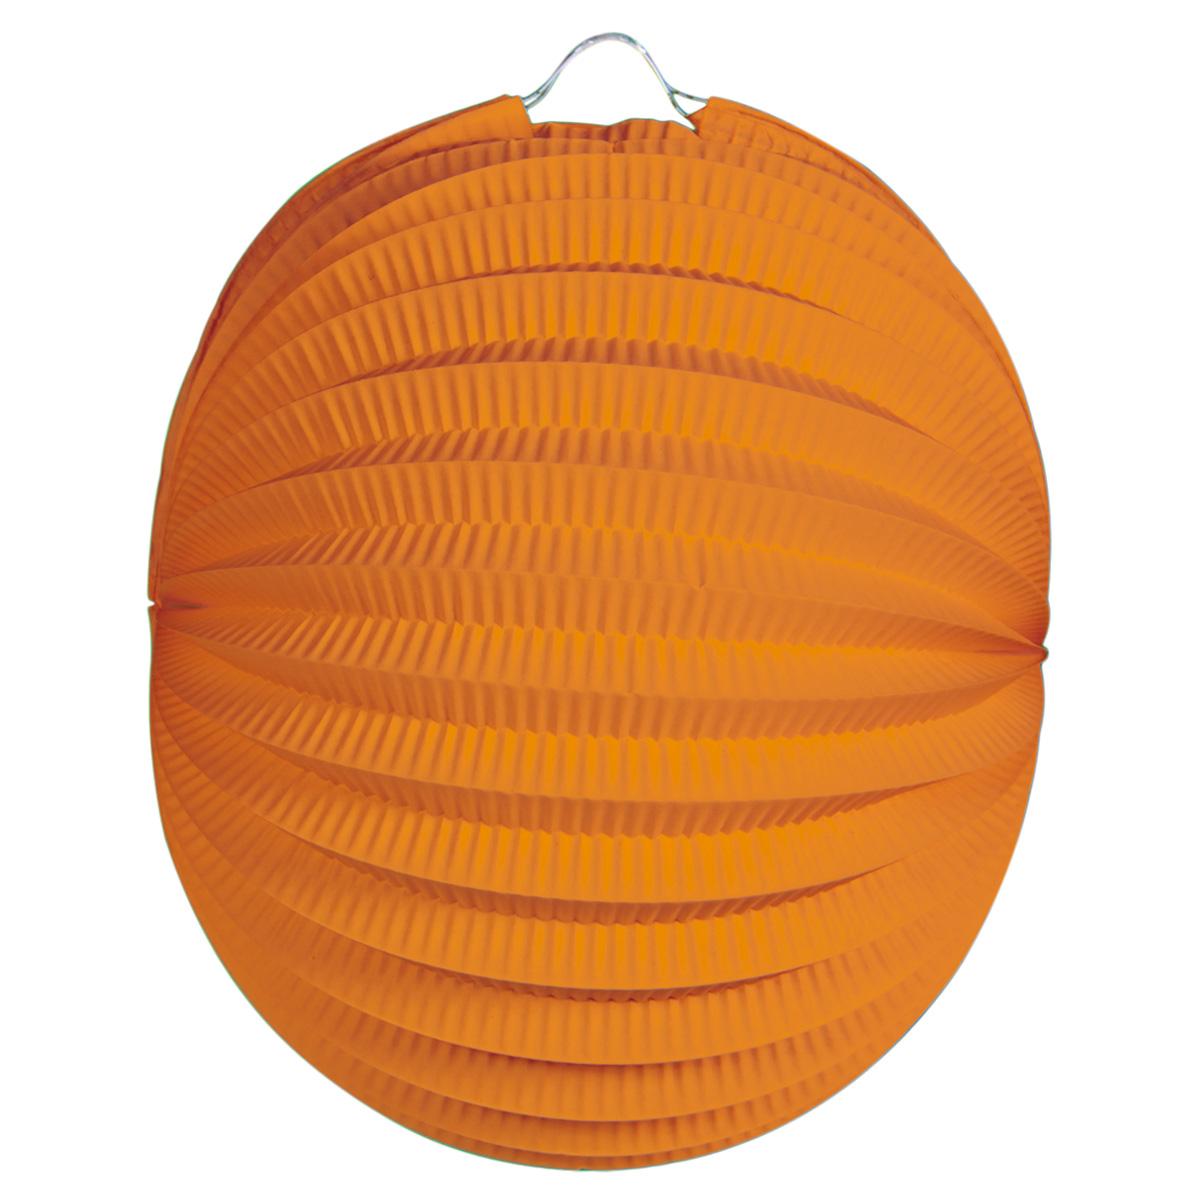 12 bollampion 22cm oranje 04846